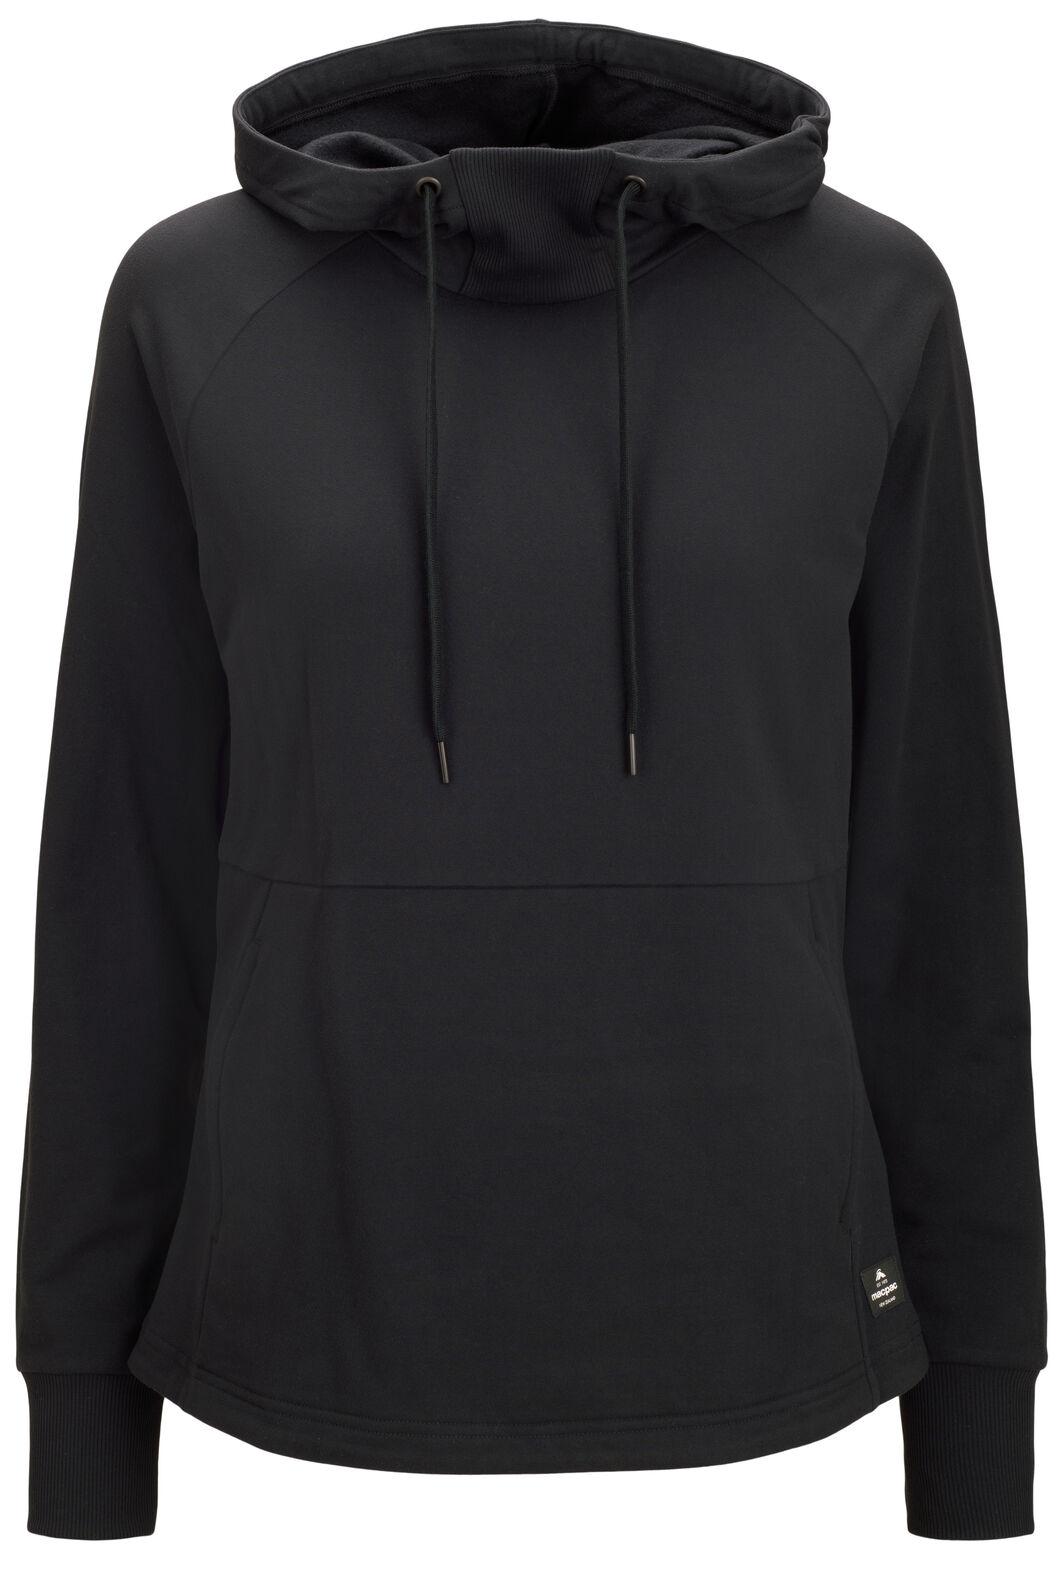 Macpac Rhythm Hooded Pullover — Women's, Black, hi-res